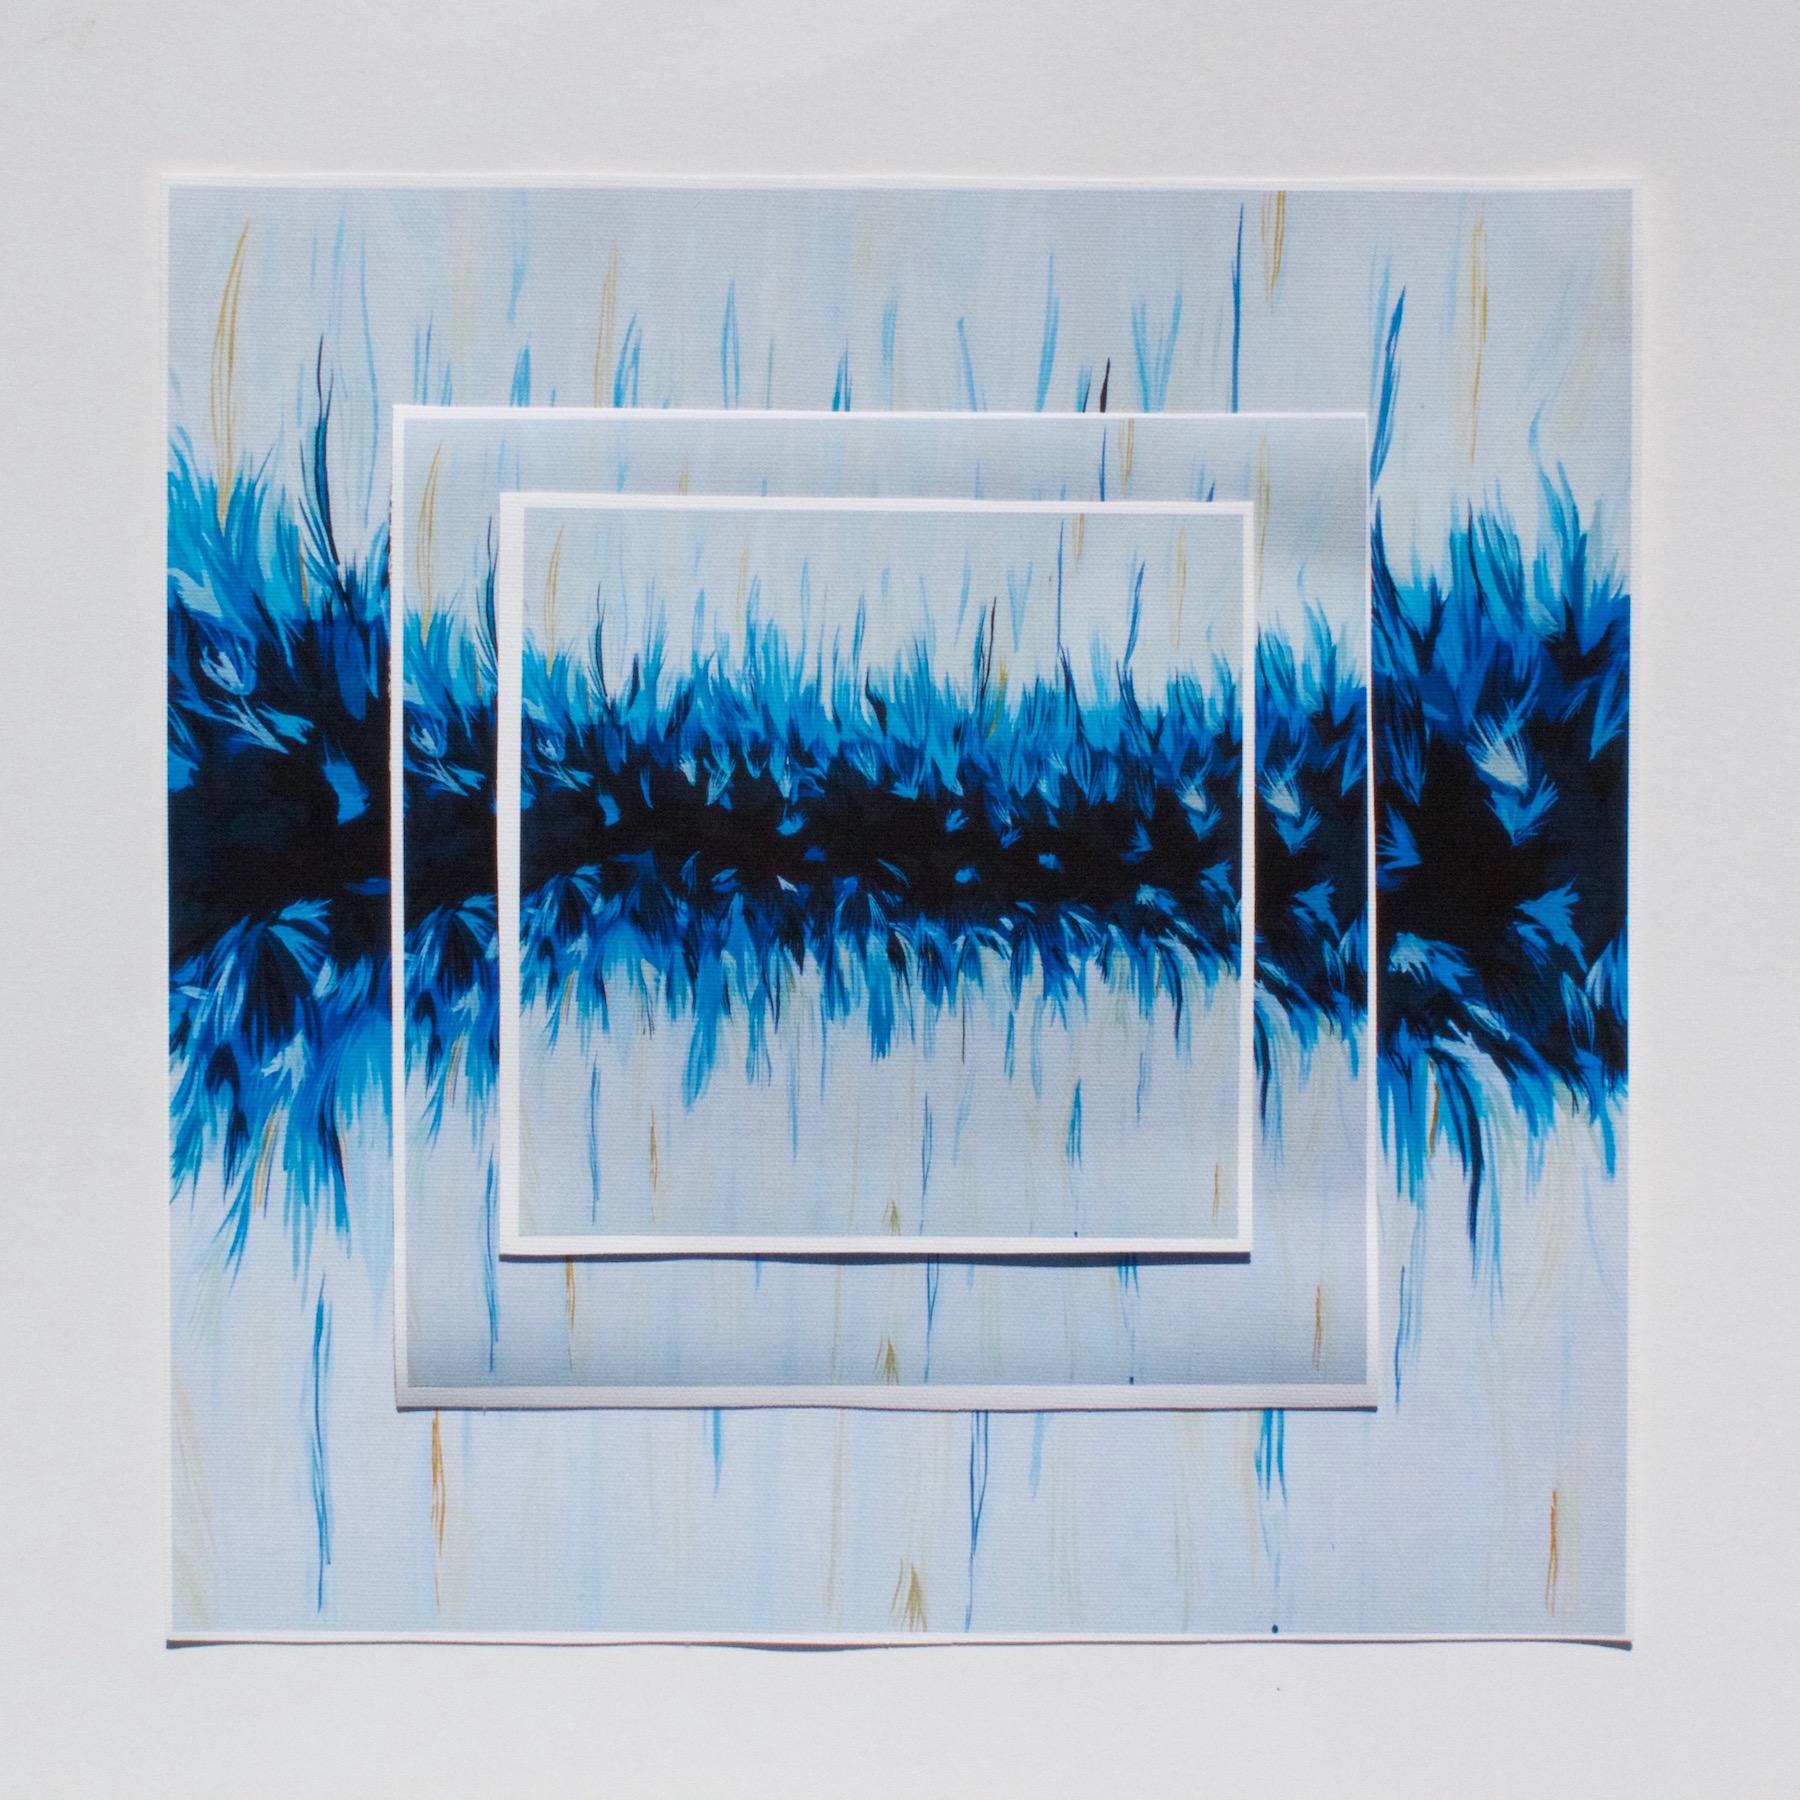 """Reflection"" fine art print on canvas 6x6"", 8x8"" & 12x12"" available"